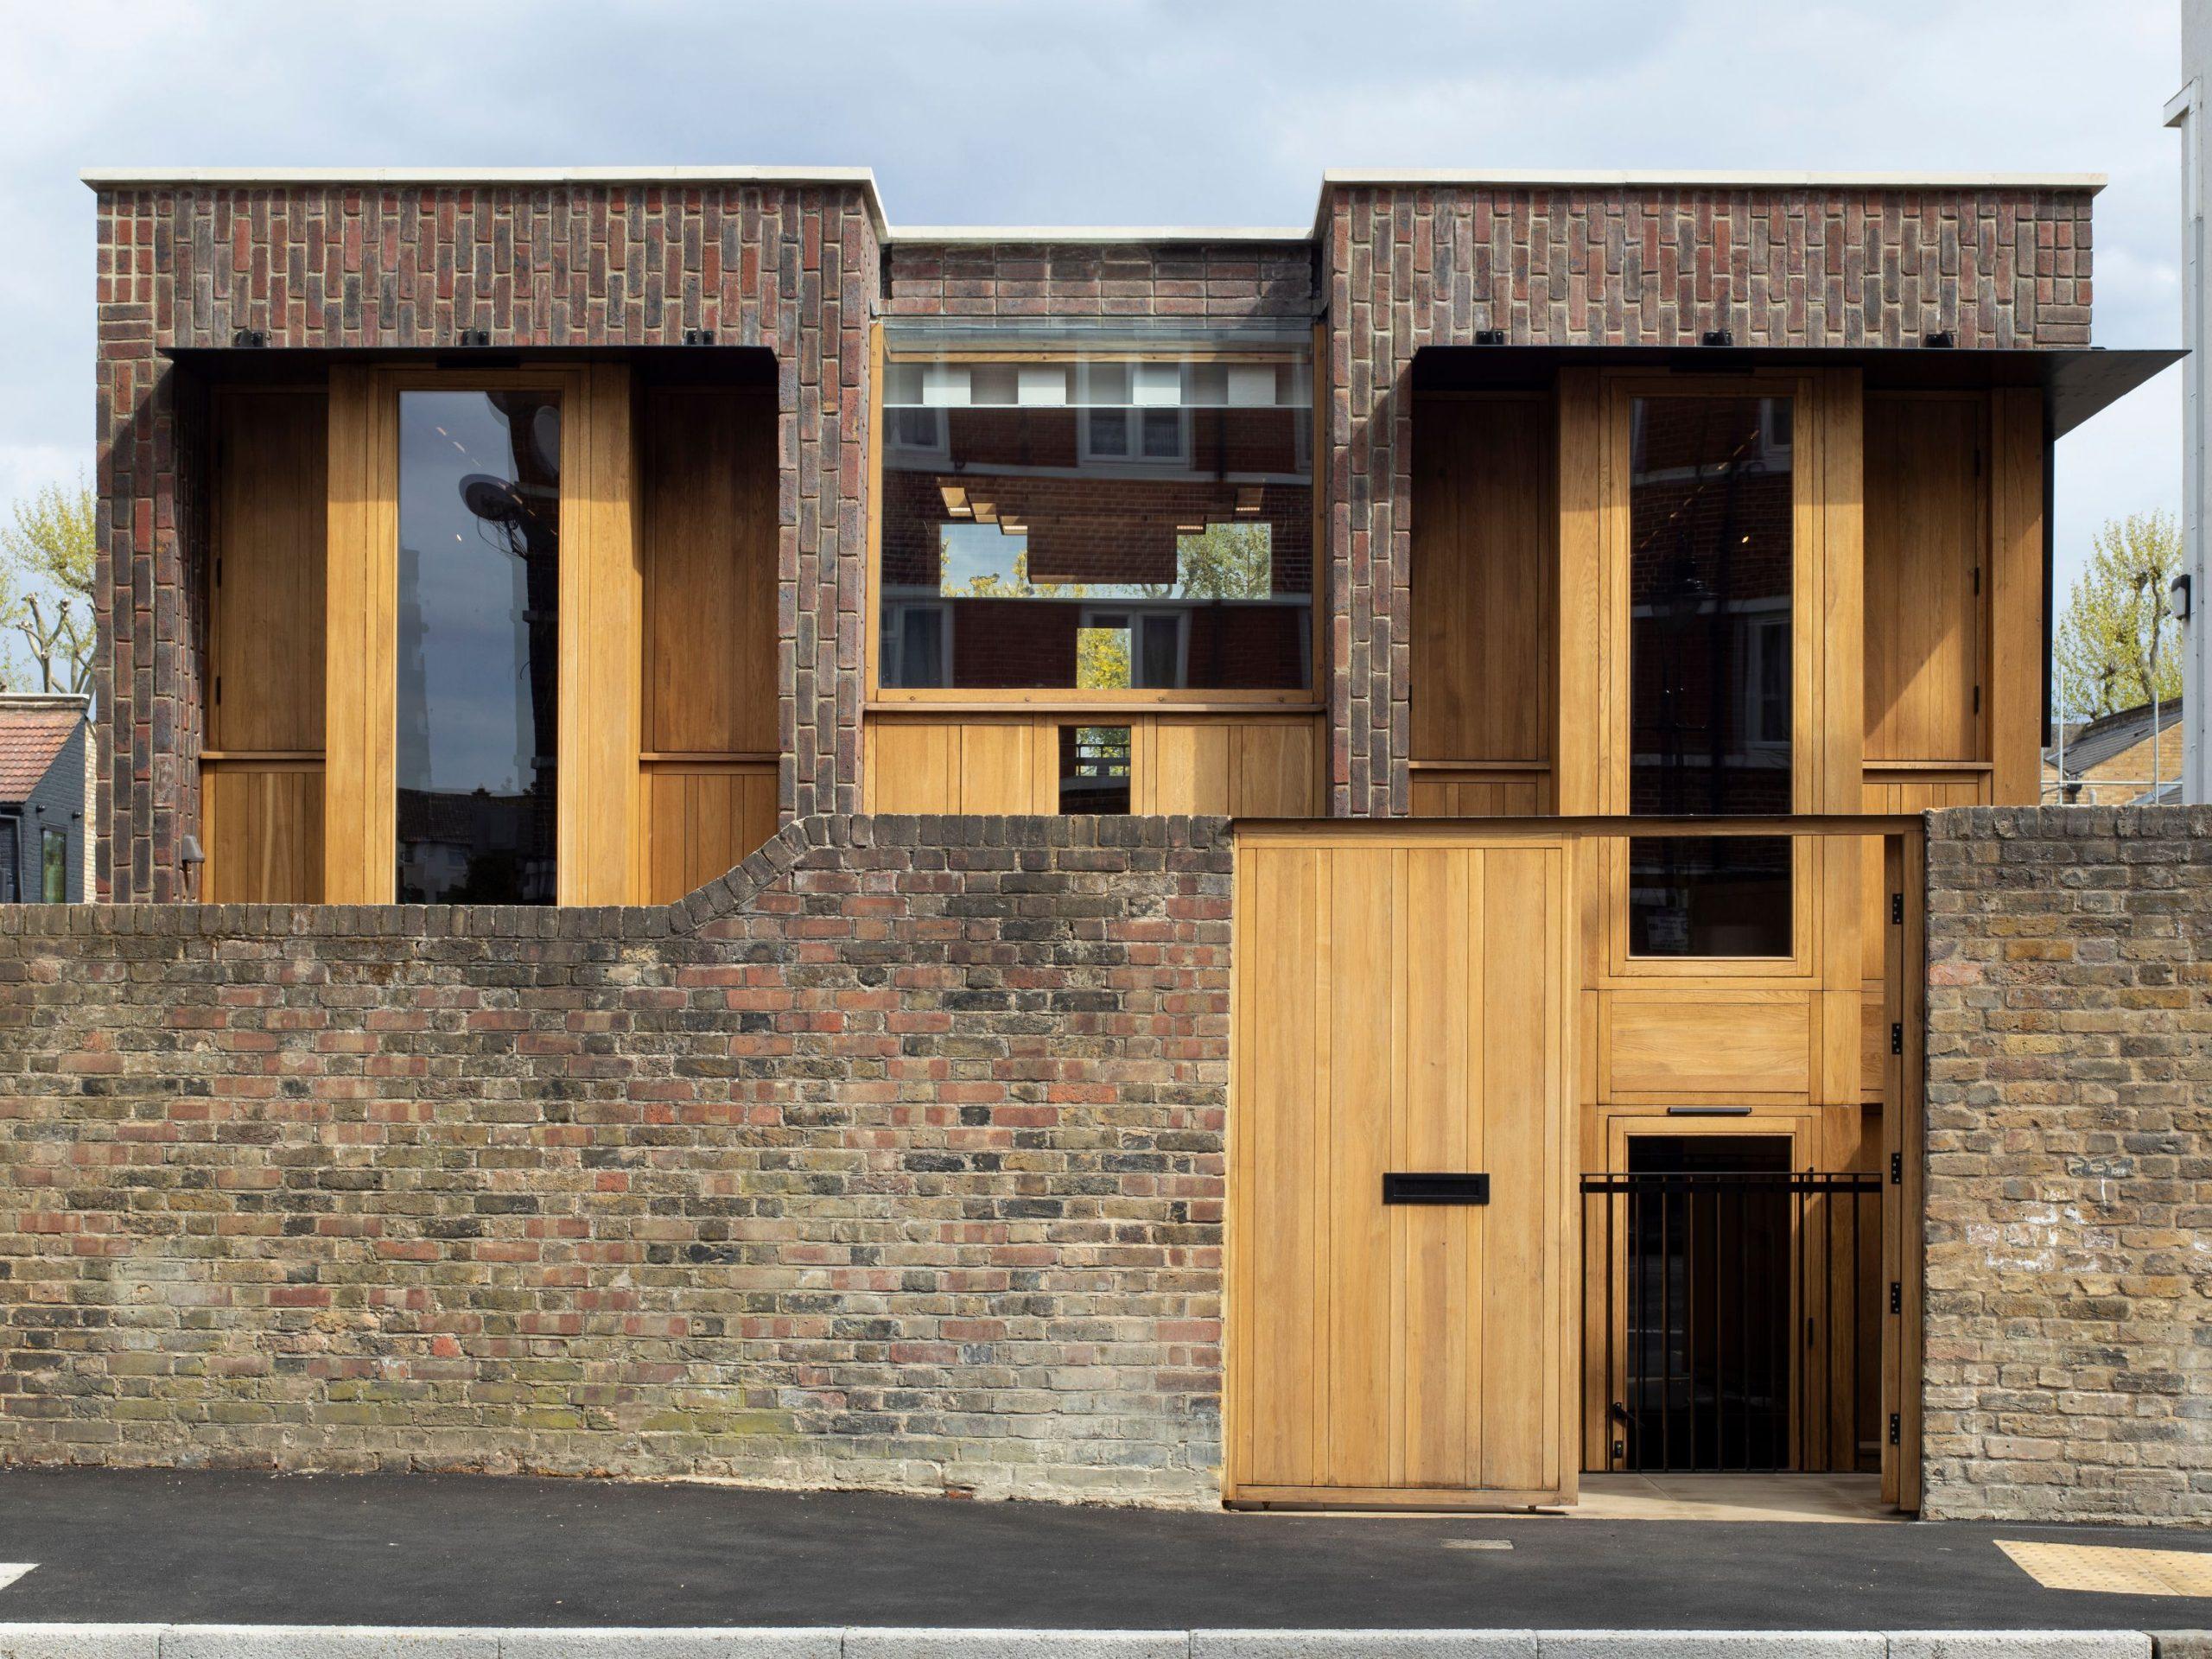 Brick_house5